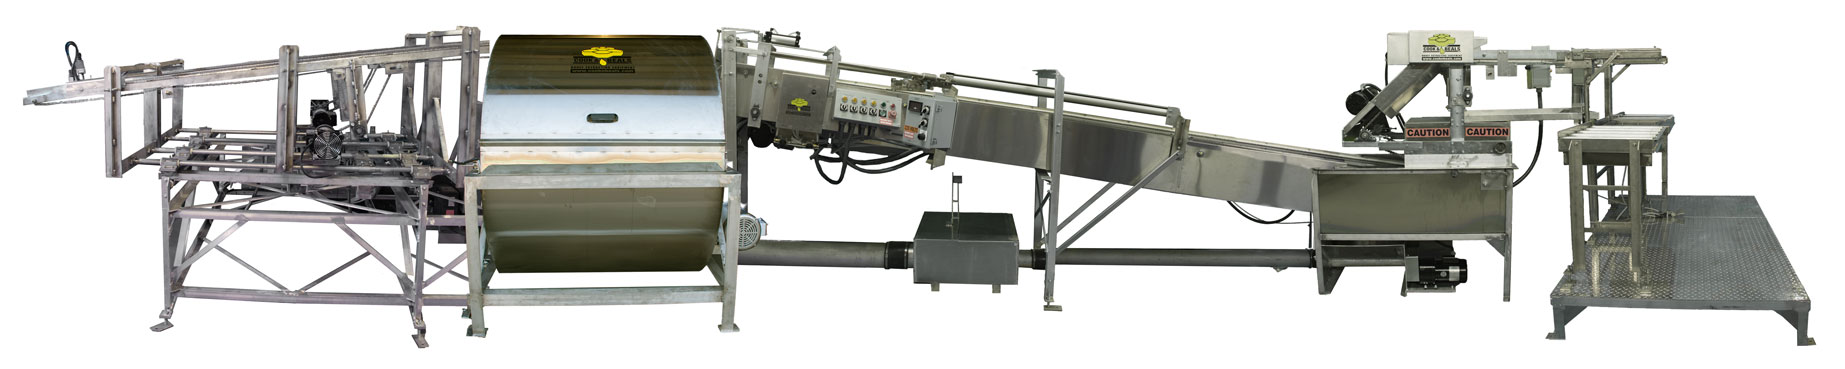 extractor line